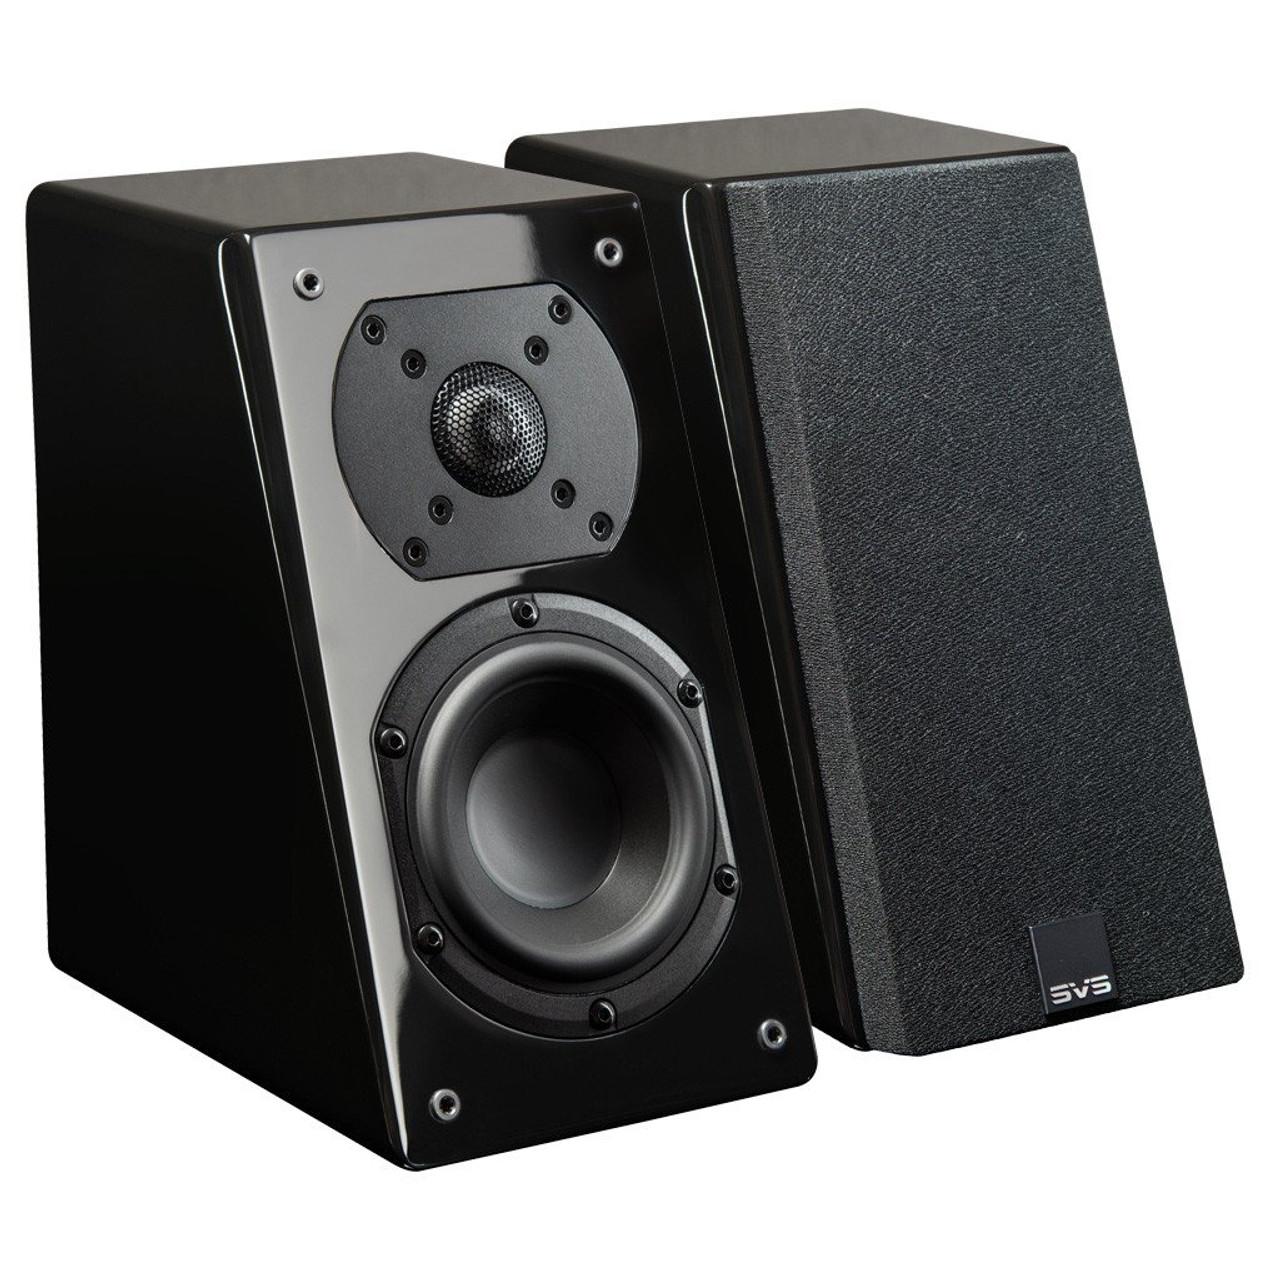 SVS Prime Elevation speakers